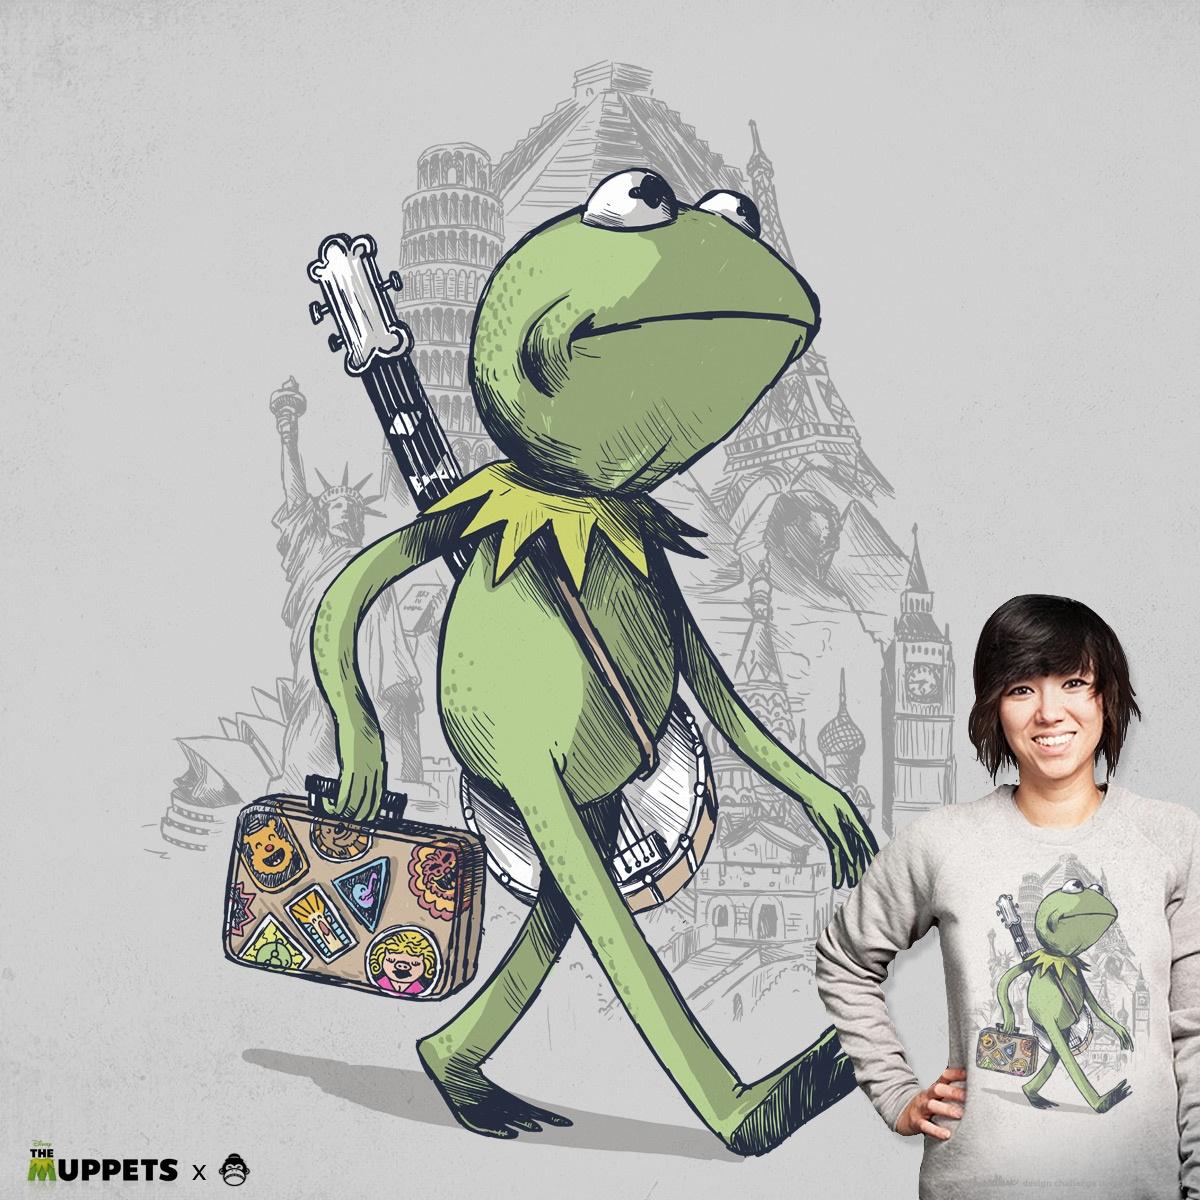 The Green Traveler by alexmdc on Threadless